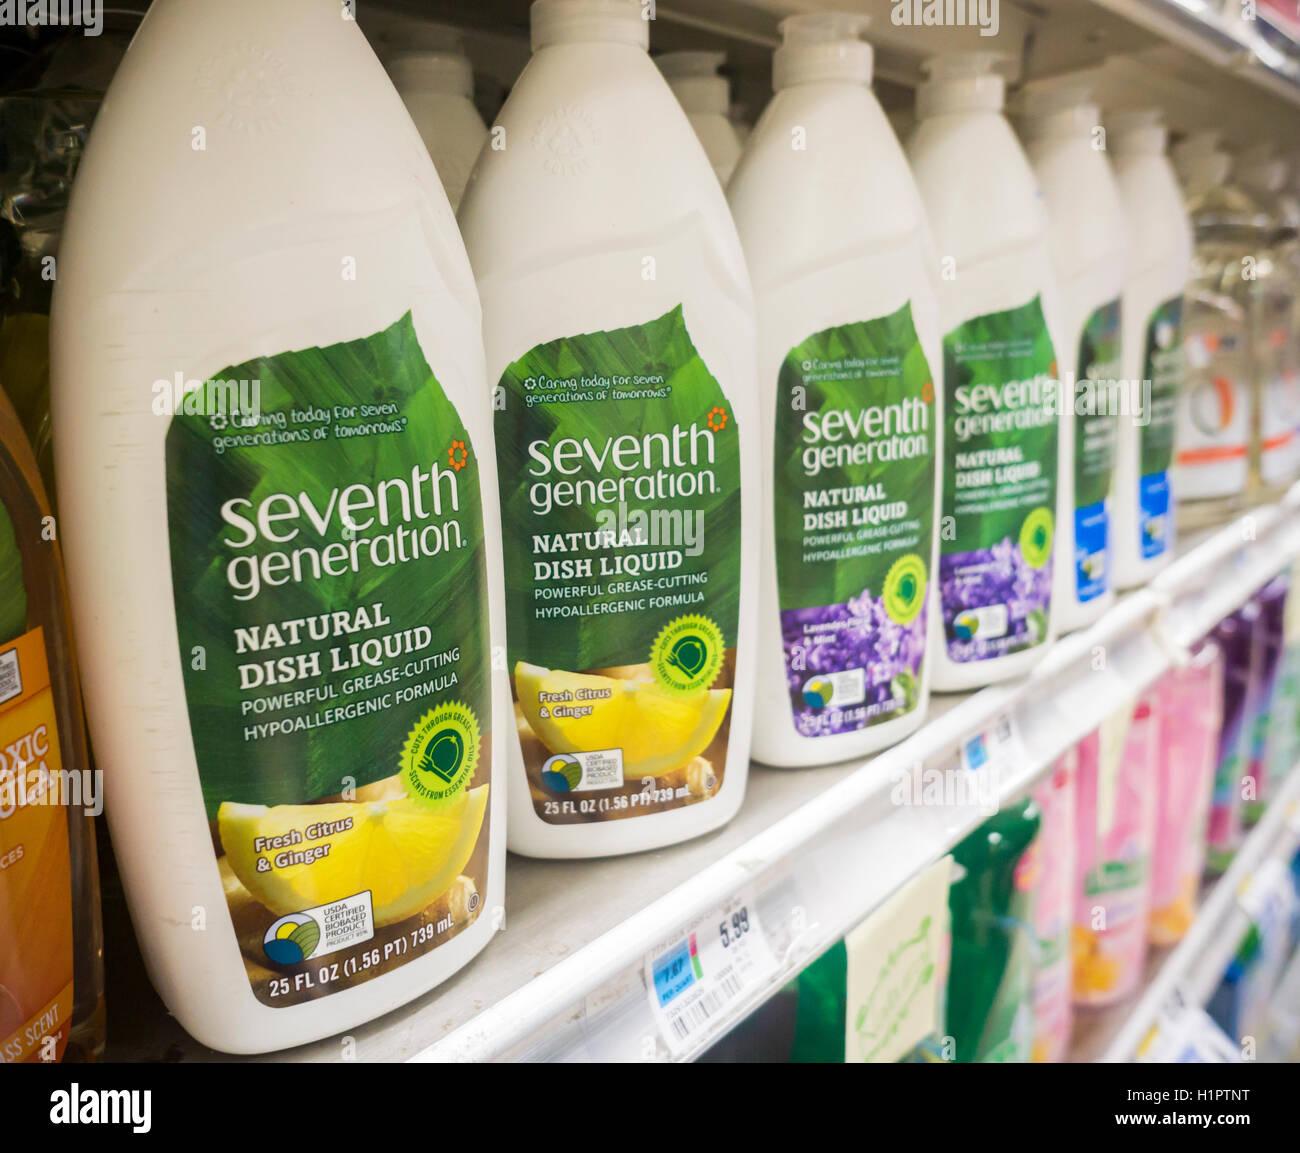 Bottles of Seventh Generation brand dishwashing liquid on a supermarket shelf in New York on Tuesday, September - Stock Image